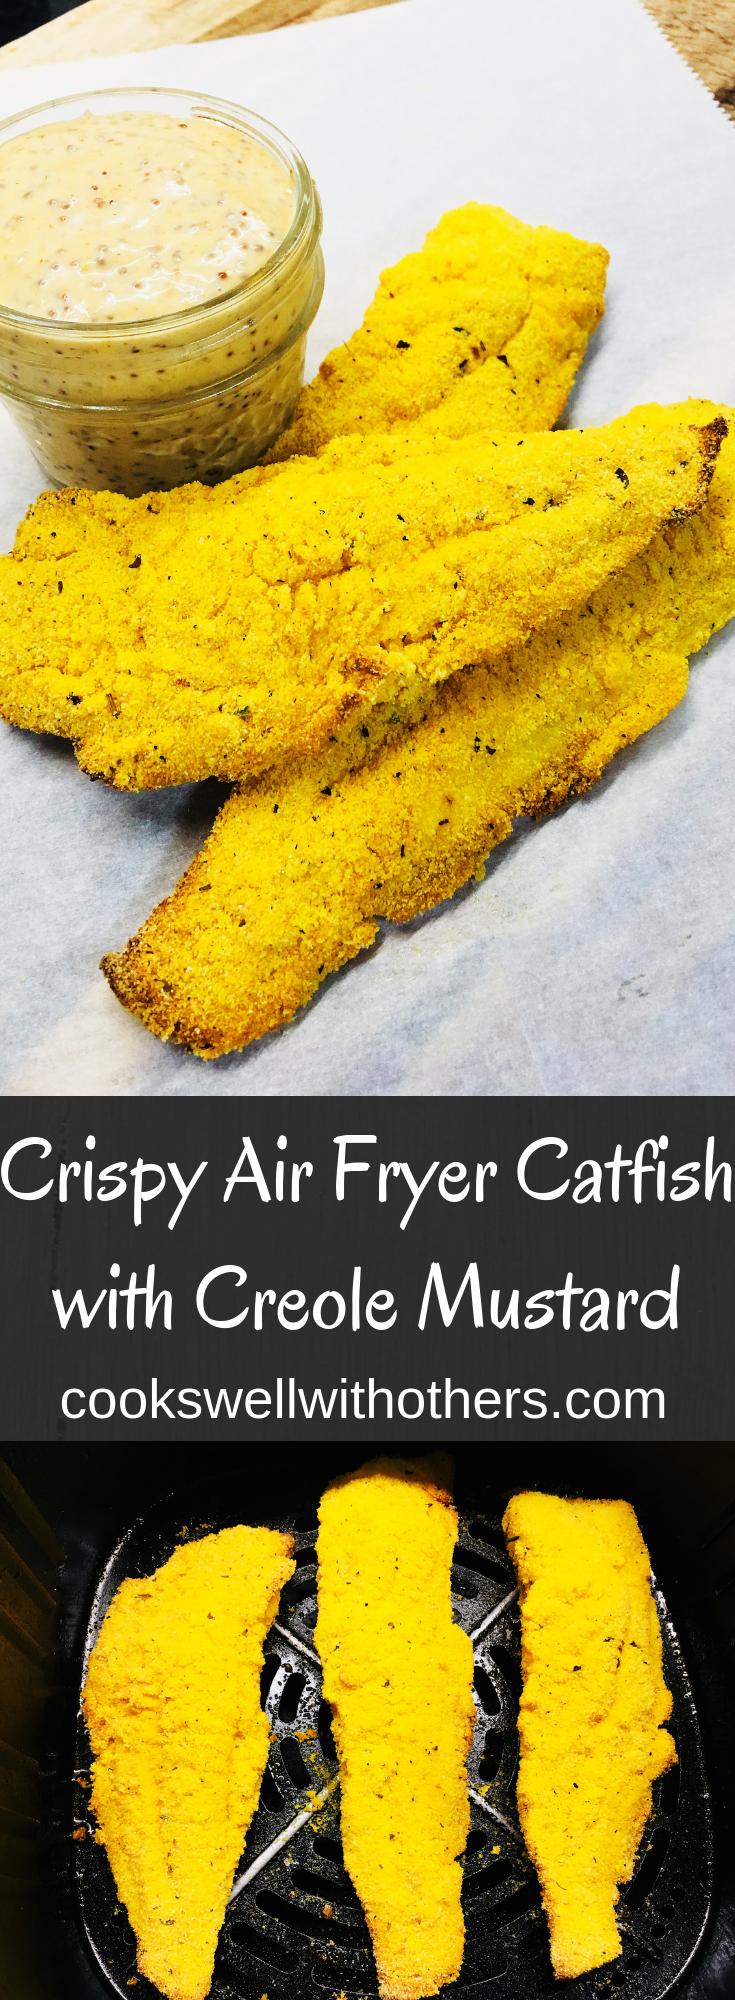 Crispy Air Fryer Catfish with Creole Mustard Recipe